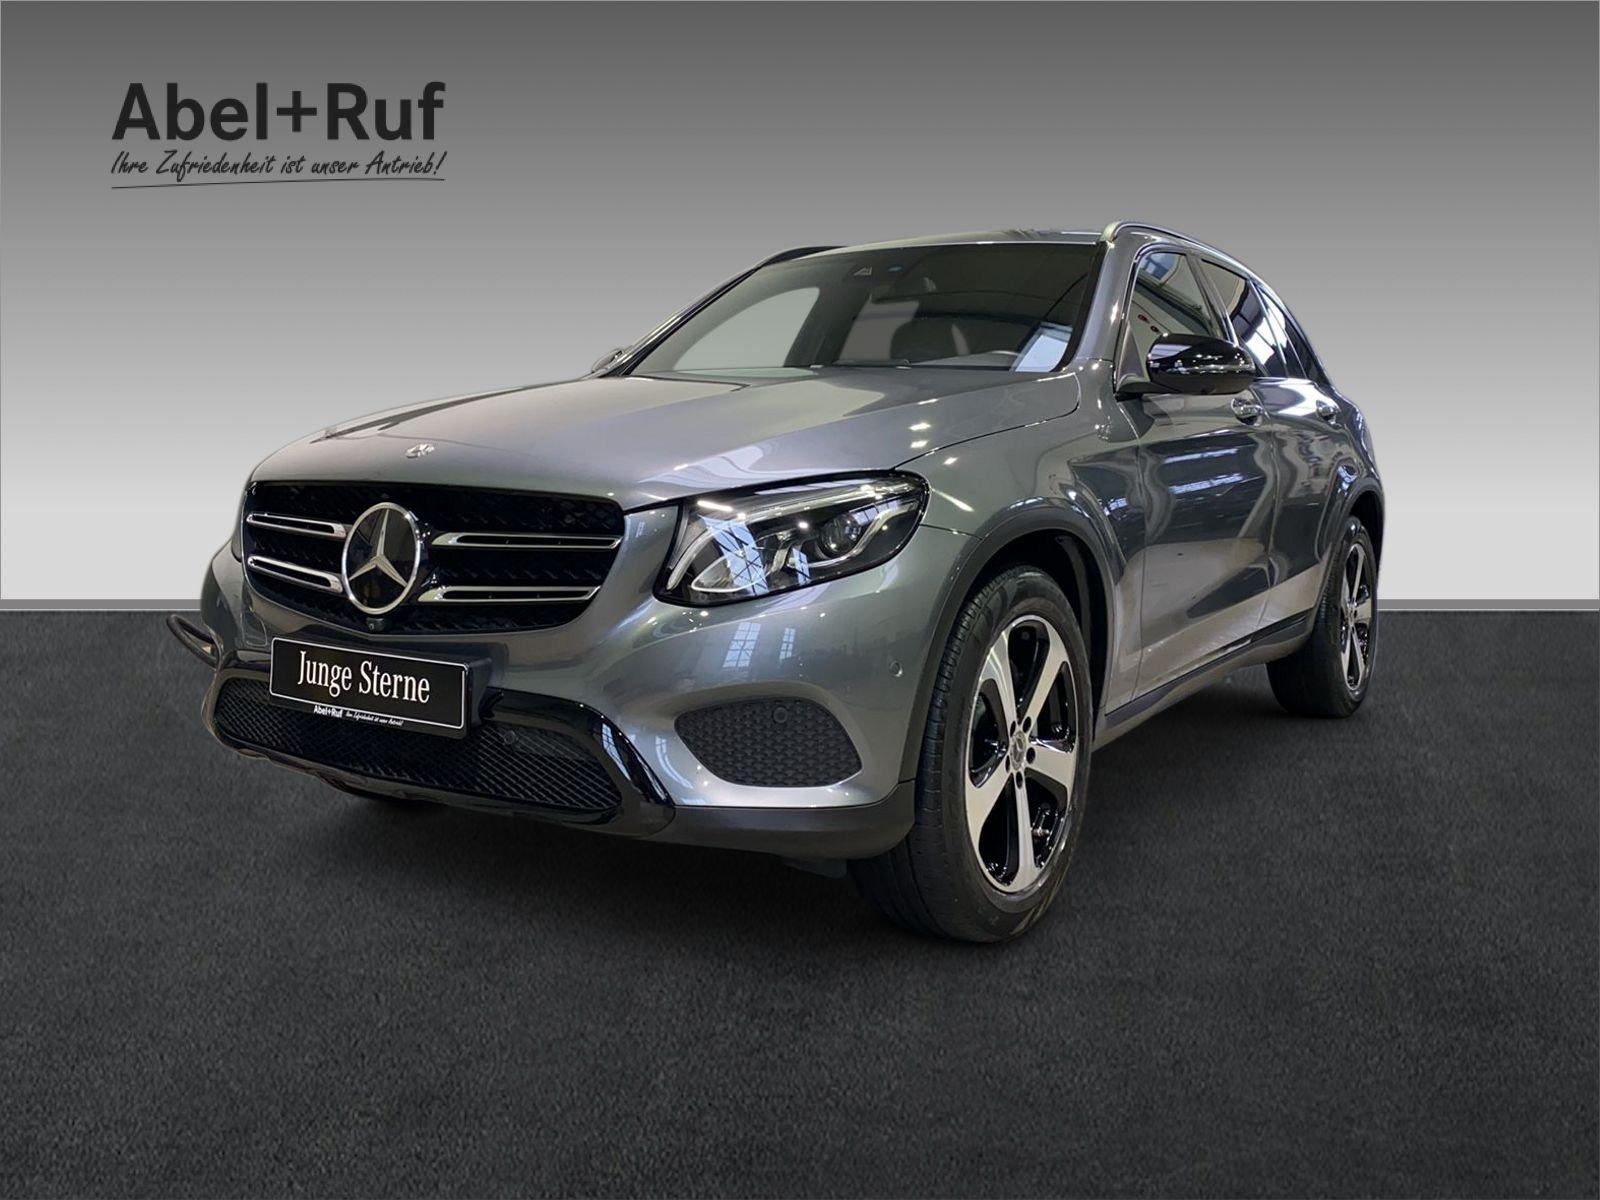 Mercedes-Benz GLC 350 d 4MATIC+EXCLUSIVE+DISTRONIC+COMAND+360, Jahr 2018, Diesel